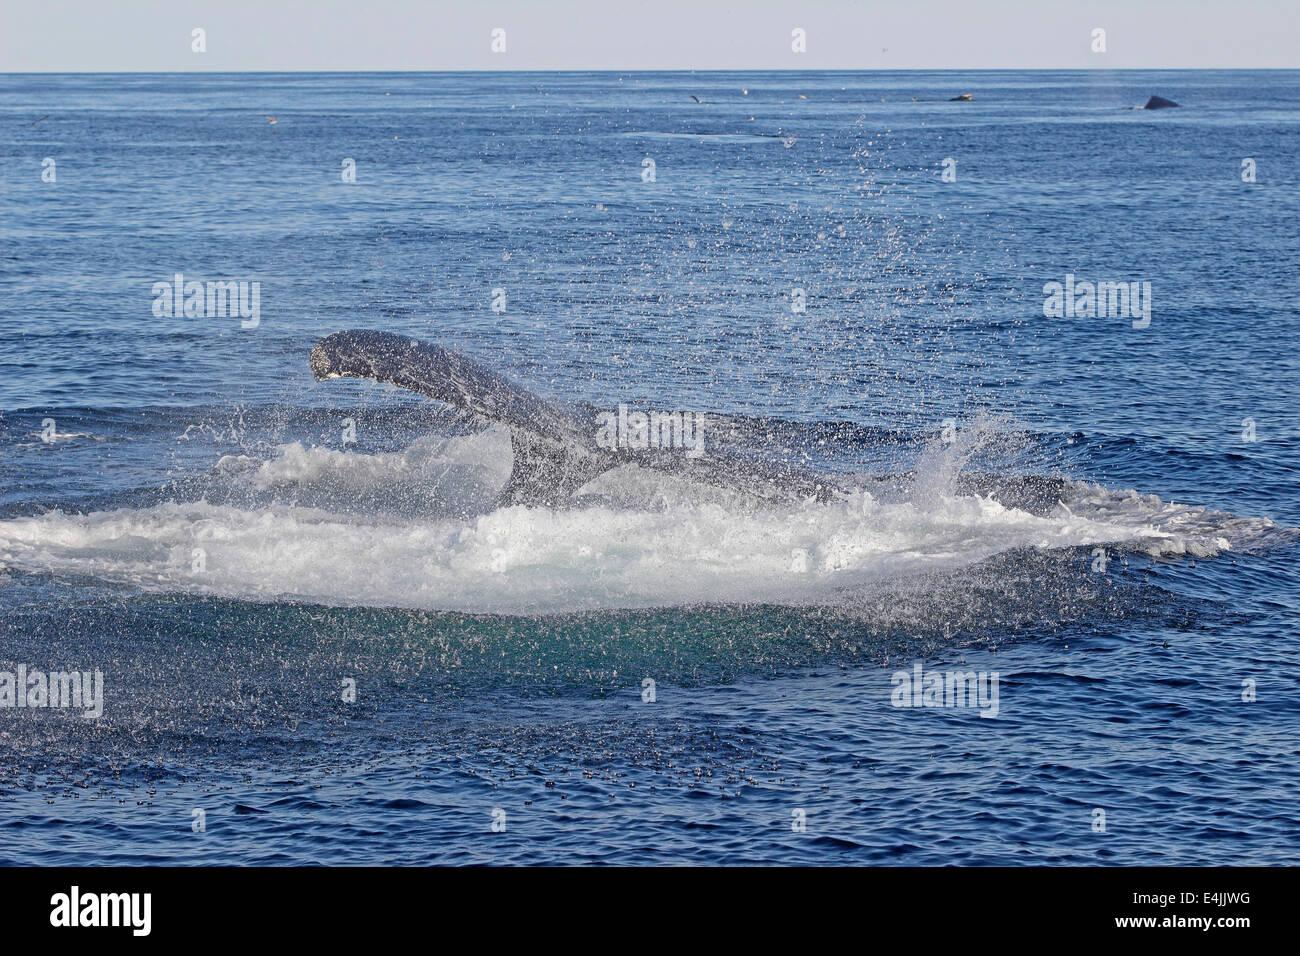 La ballena jorobada (Megaptera novaeangliae) incumplimiento de alimentación Foto de stock